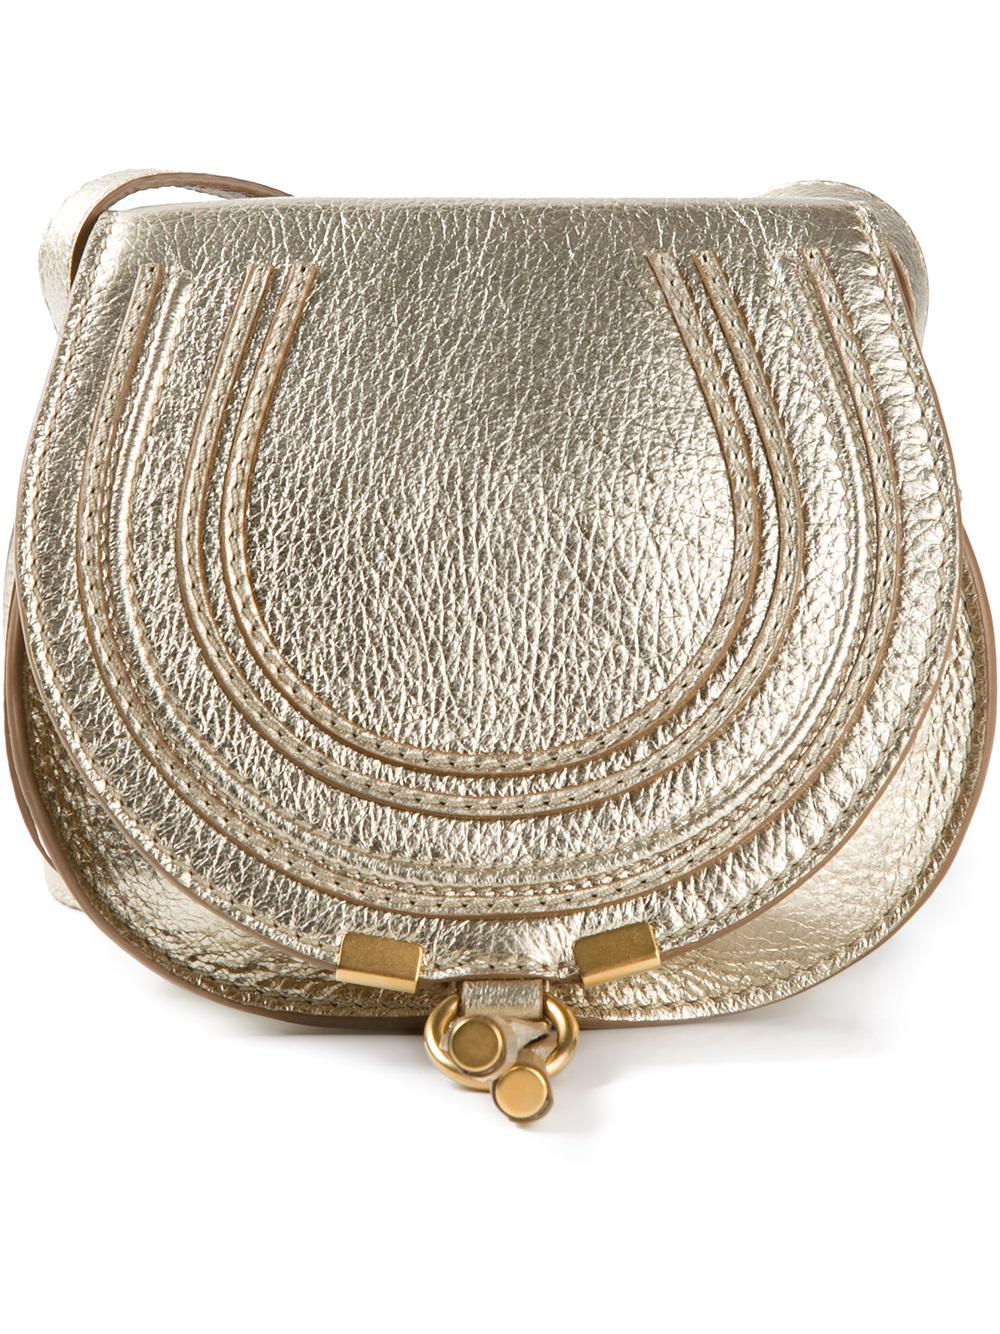 8fc3c90c Chloé Metallic Small Marcie Crossbody Bag